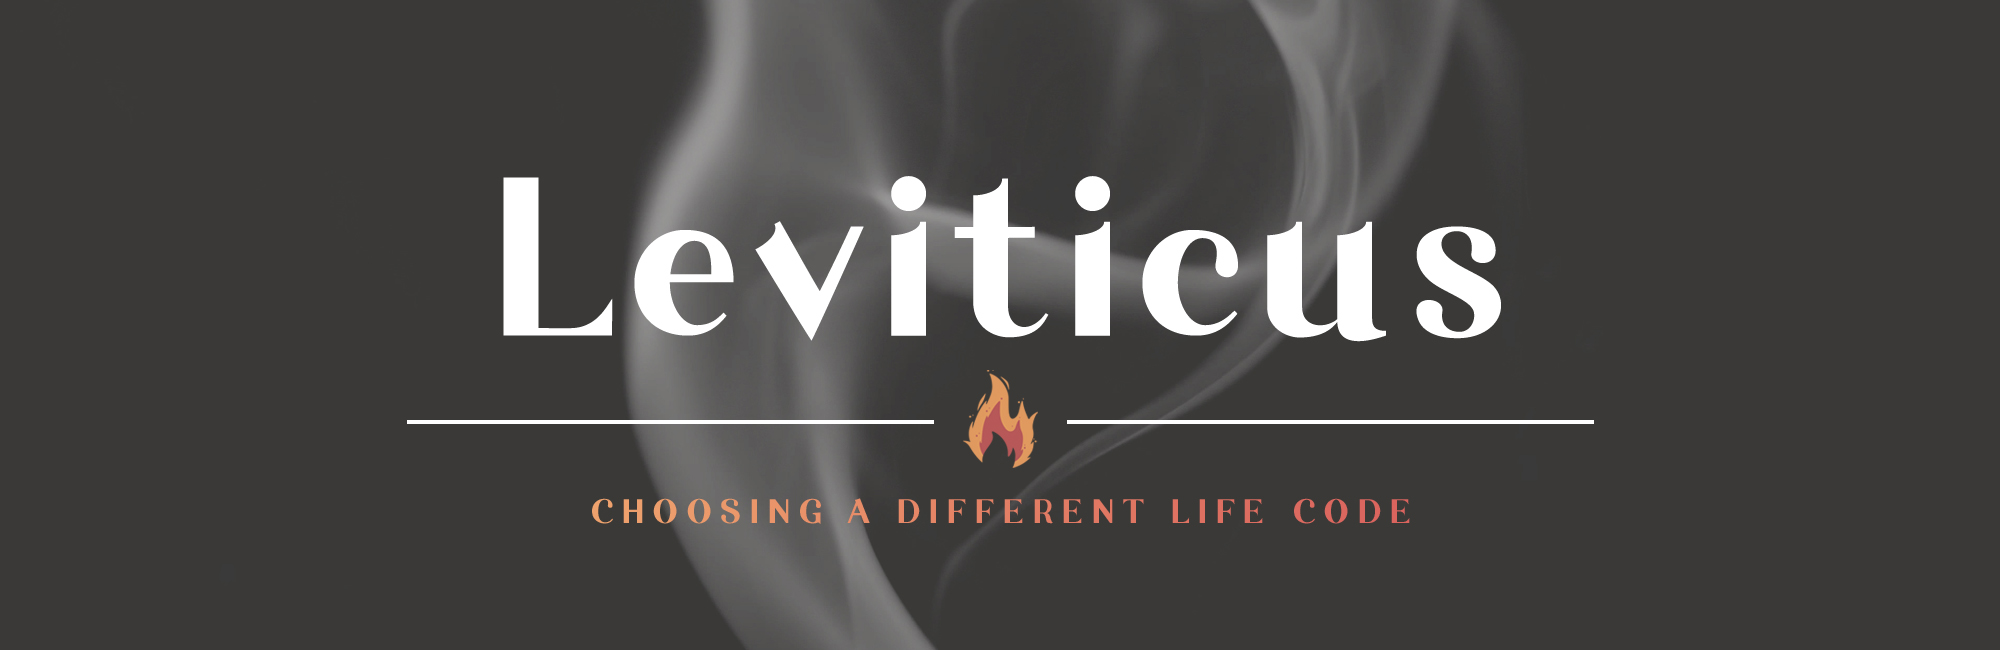 Leviticus-Web-Message-Header